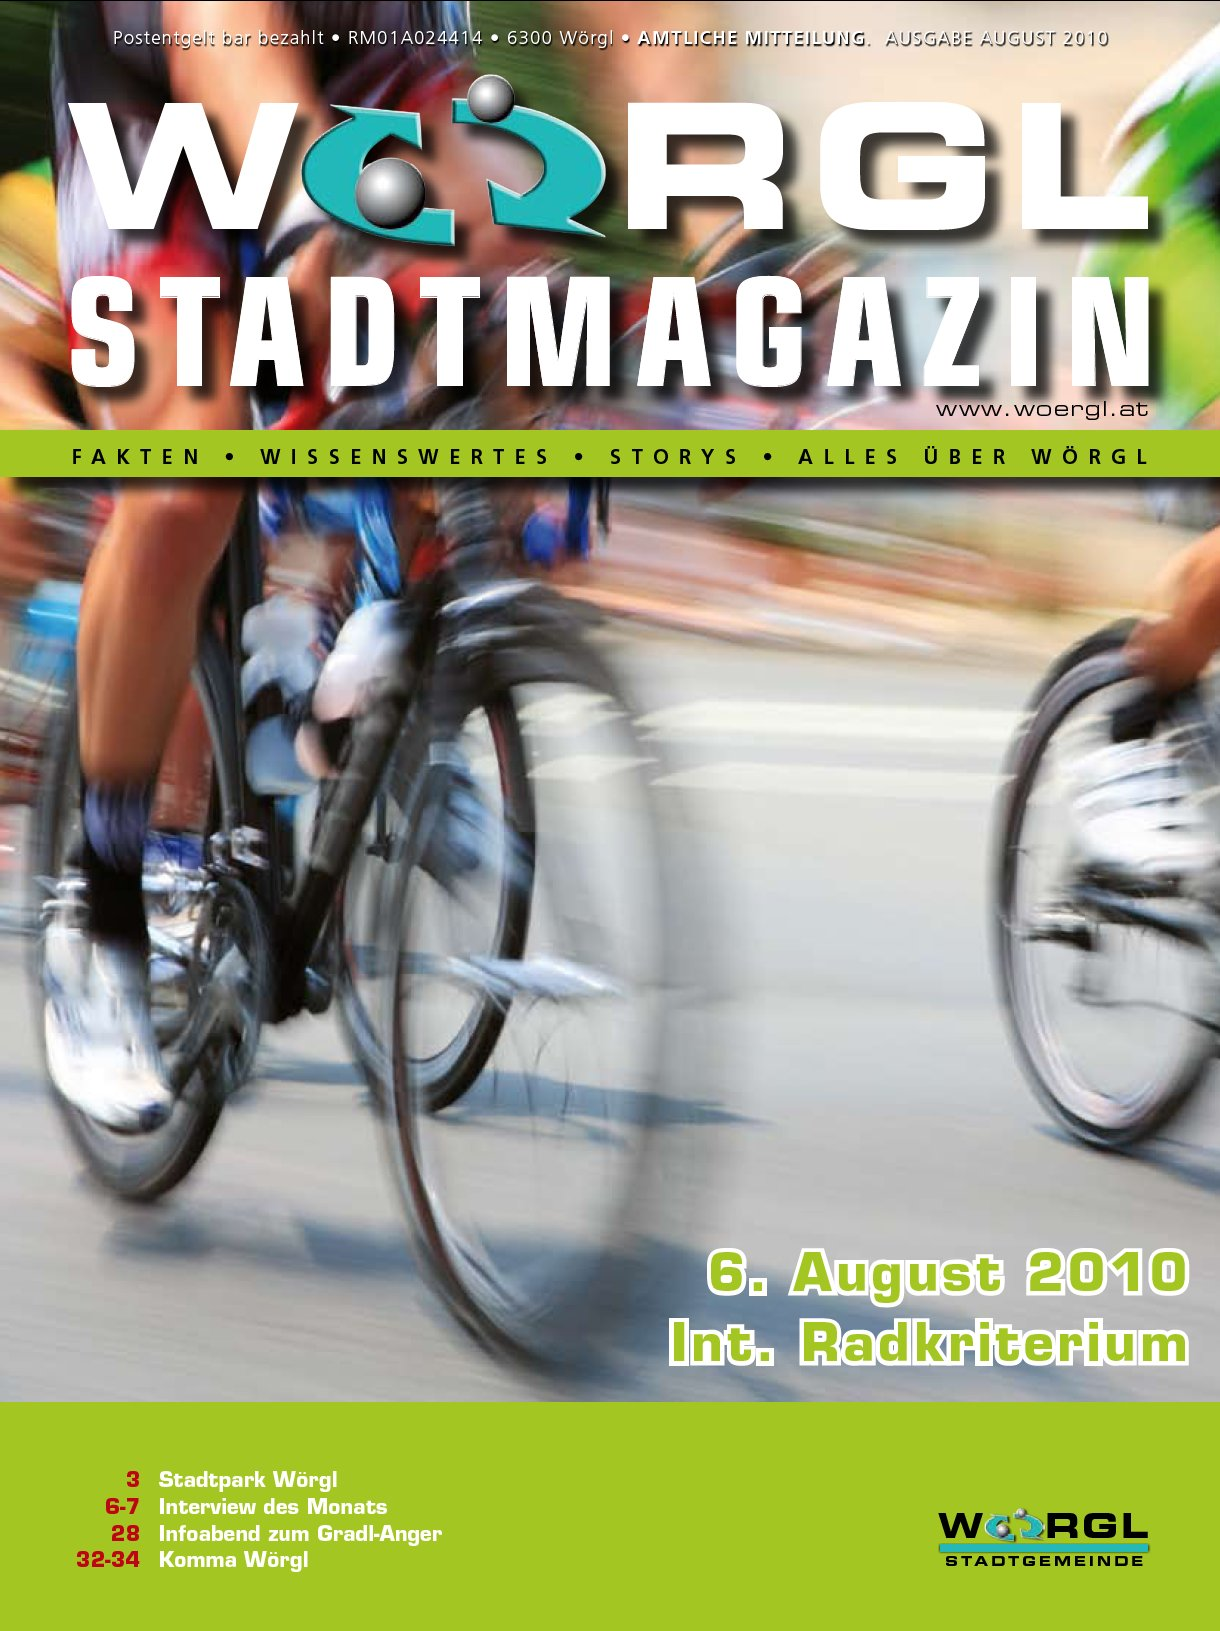 Wörgler Stadtmagazin August 2010